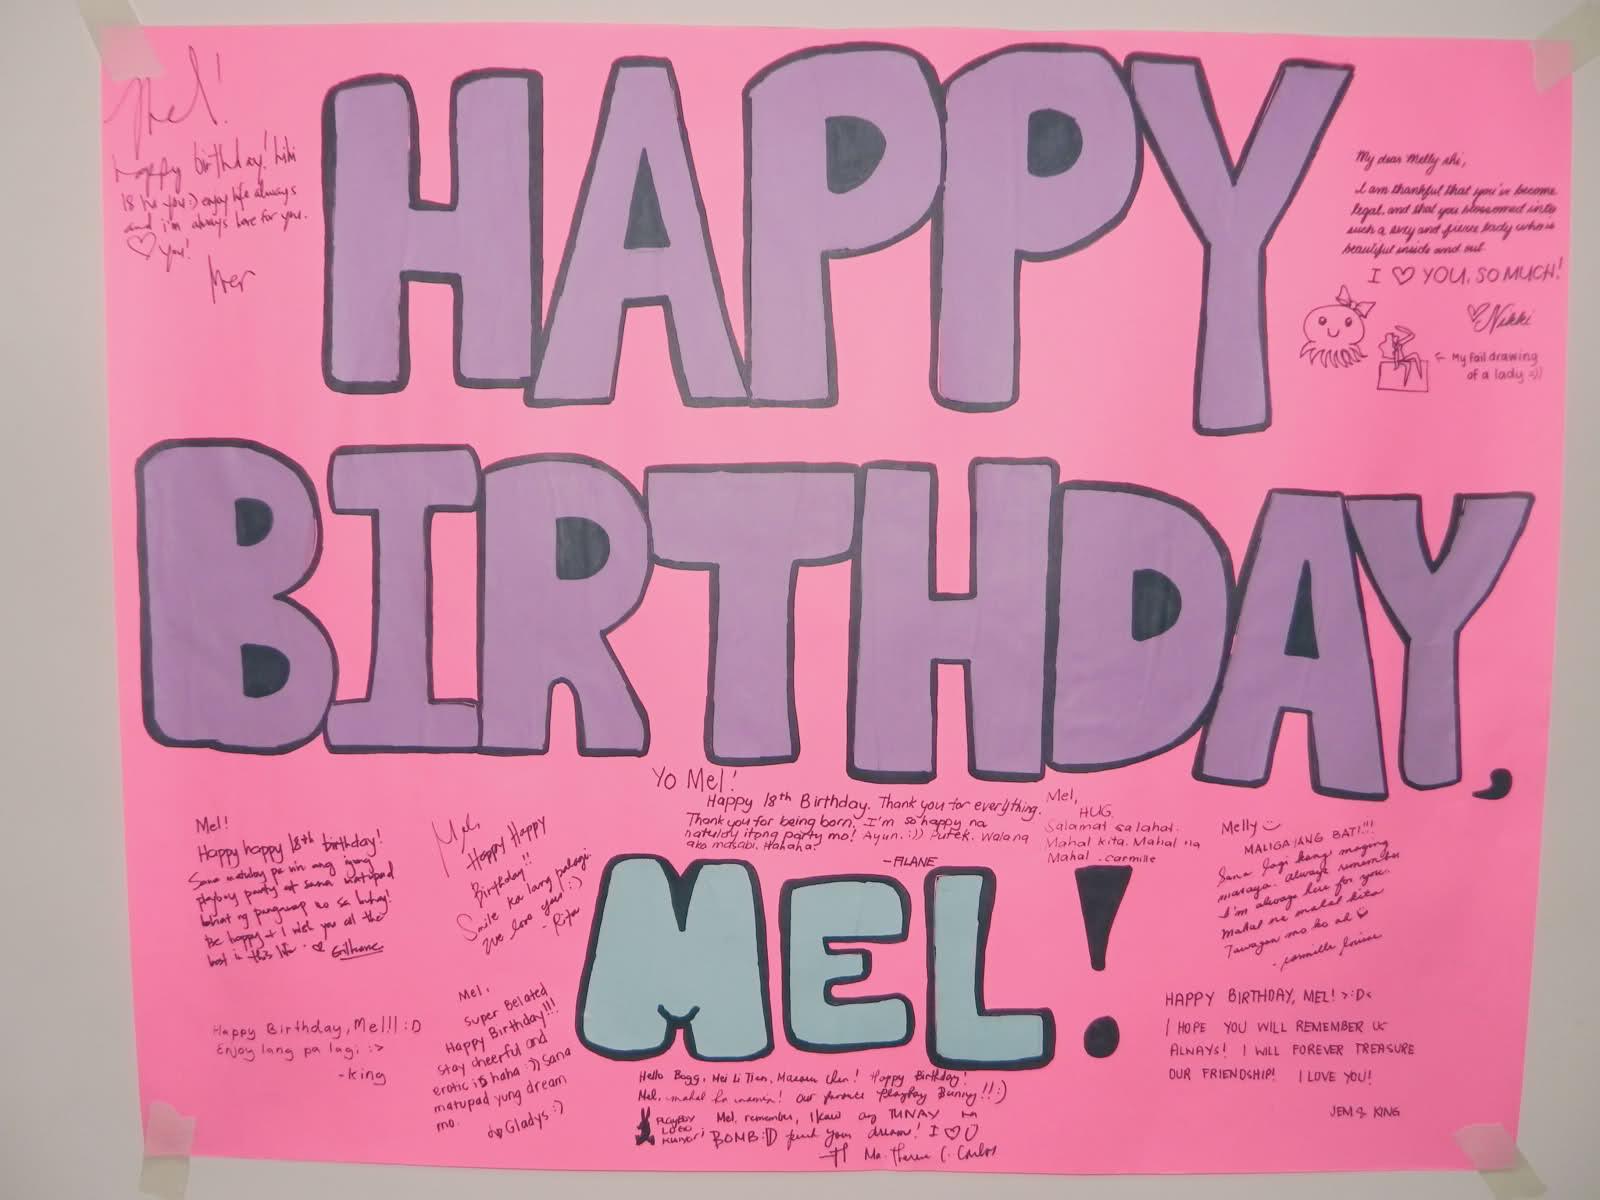 Birthday Card Tumblr Funny ~ New birthday ideas for boyfriend tumblr